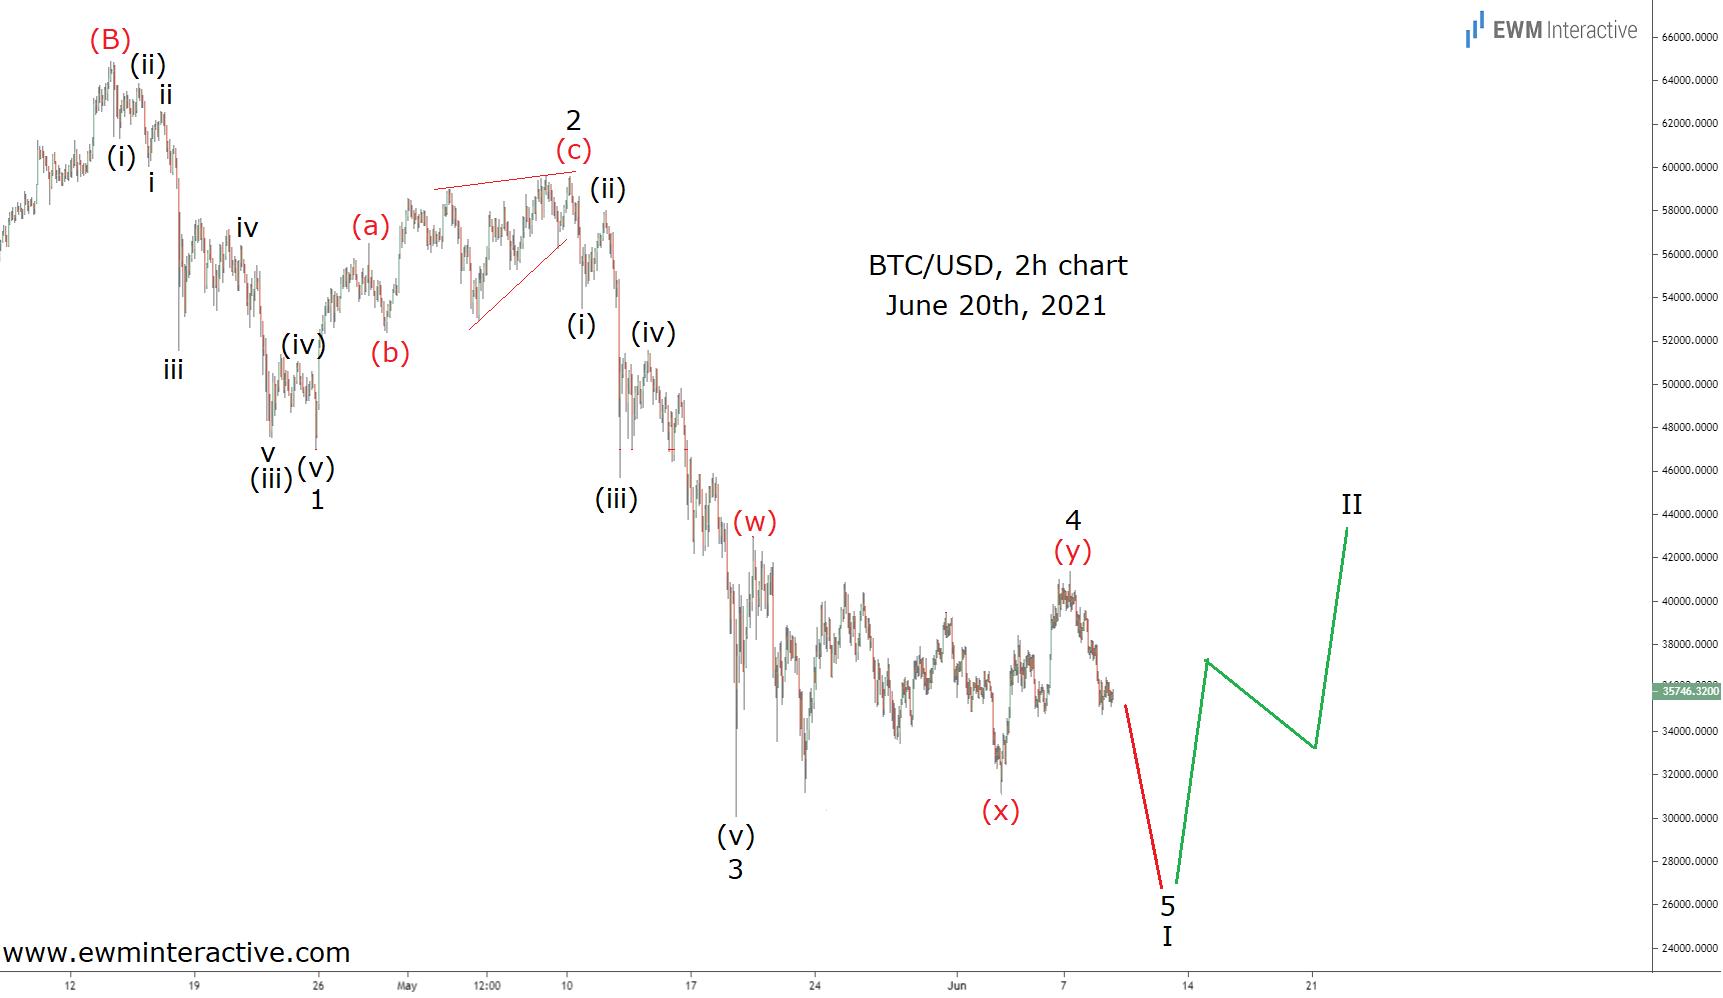 BTC/USD 2-Hr Chart - June 20th, 2021